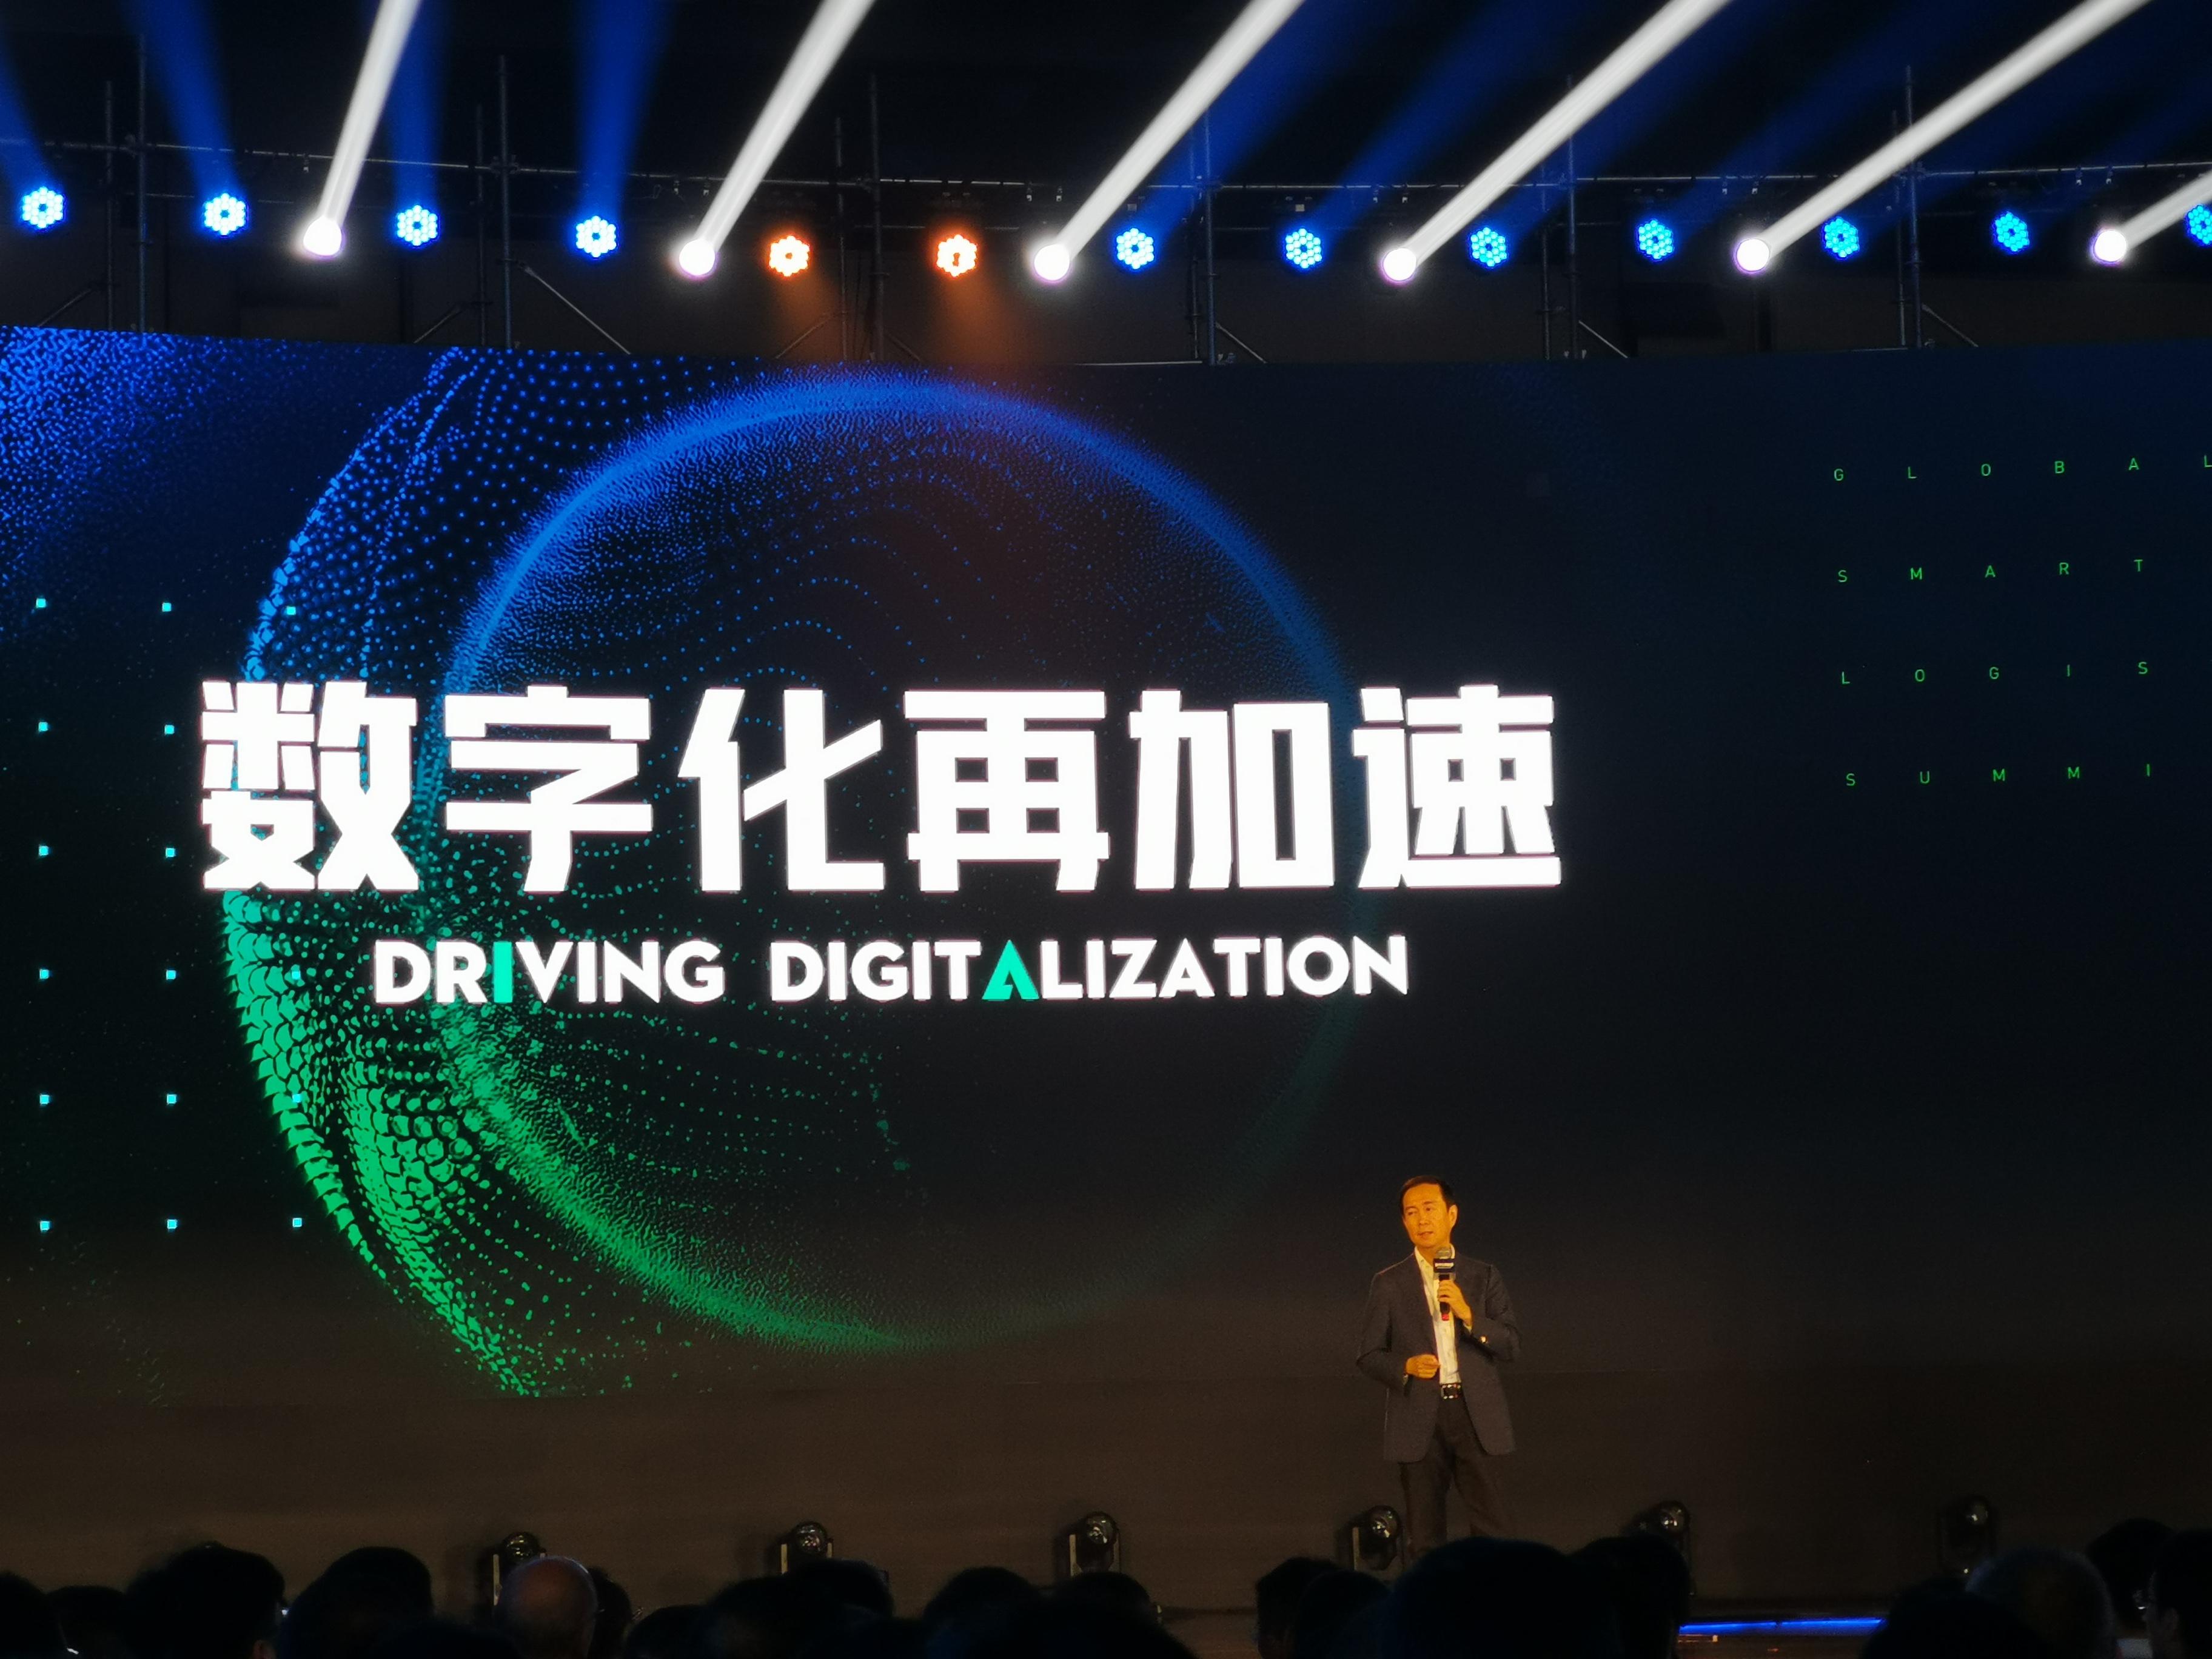 <b>阿里张勇:物流数字化正在向数智化转变</b>